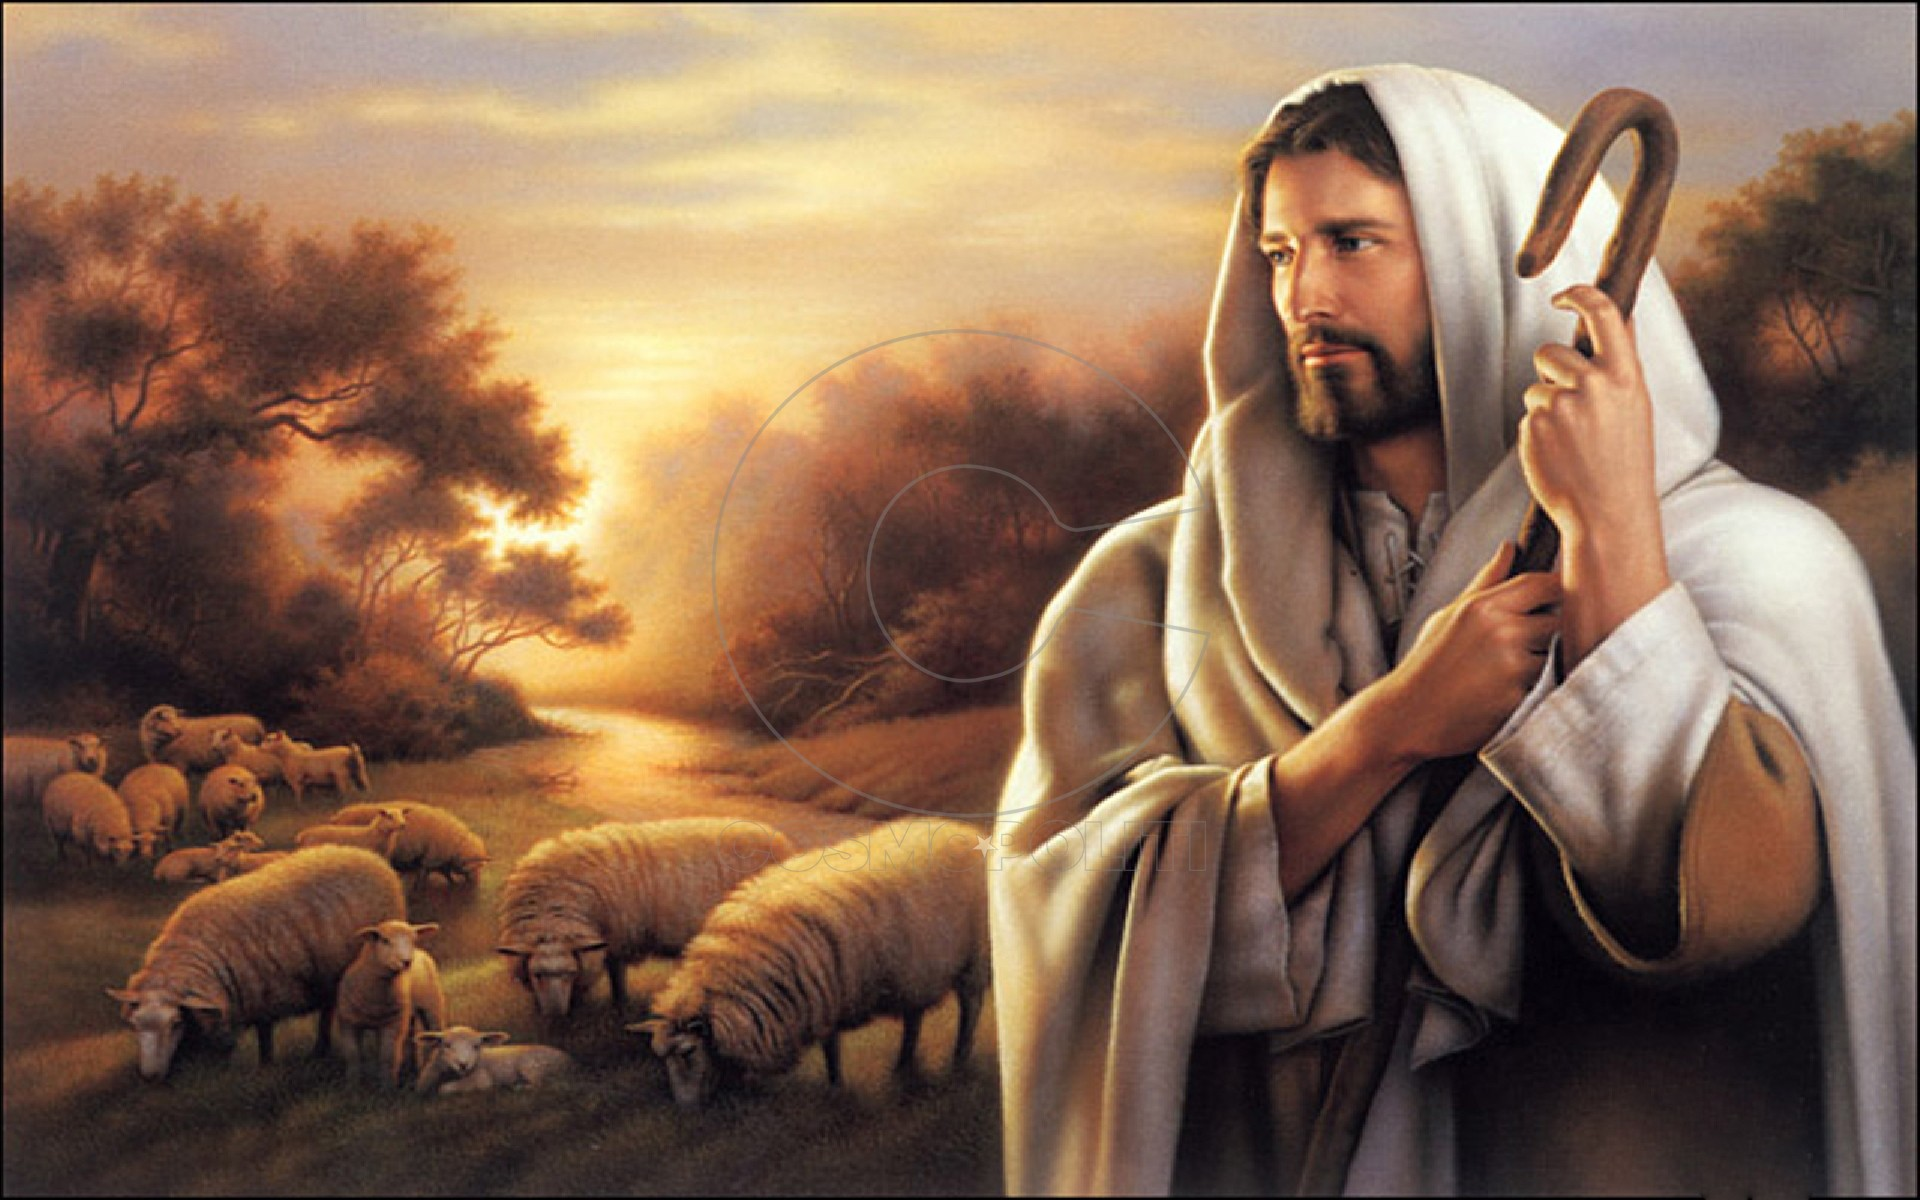 jesus-christ-wallpaper-17